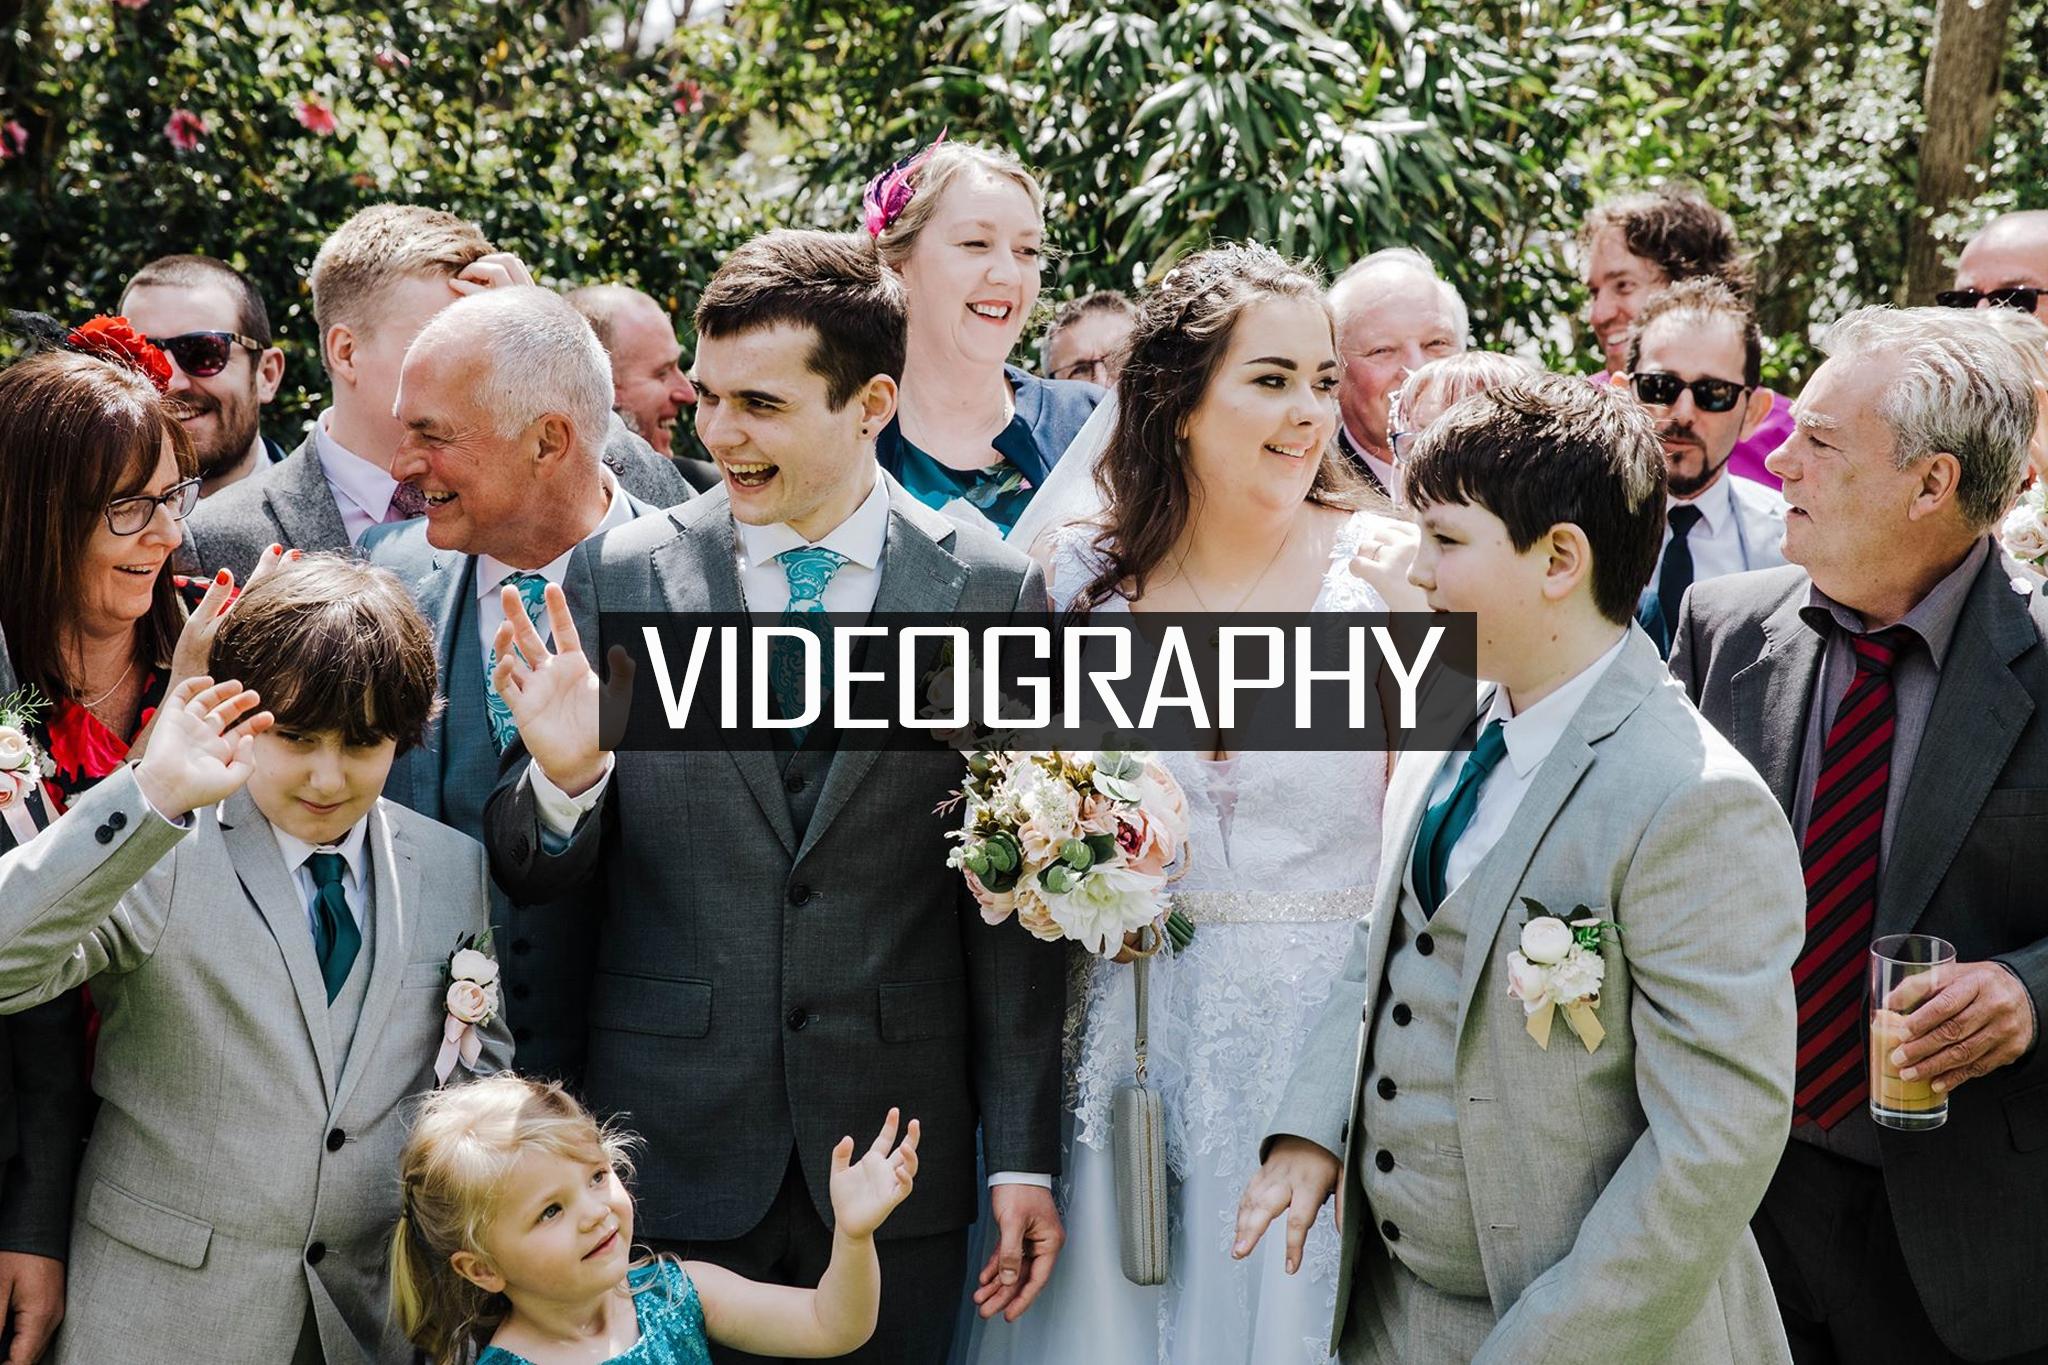 Cornwall Wedding dj and photographer